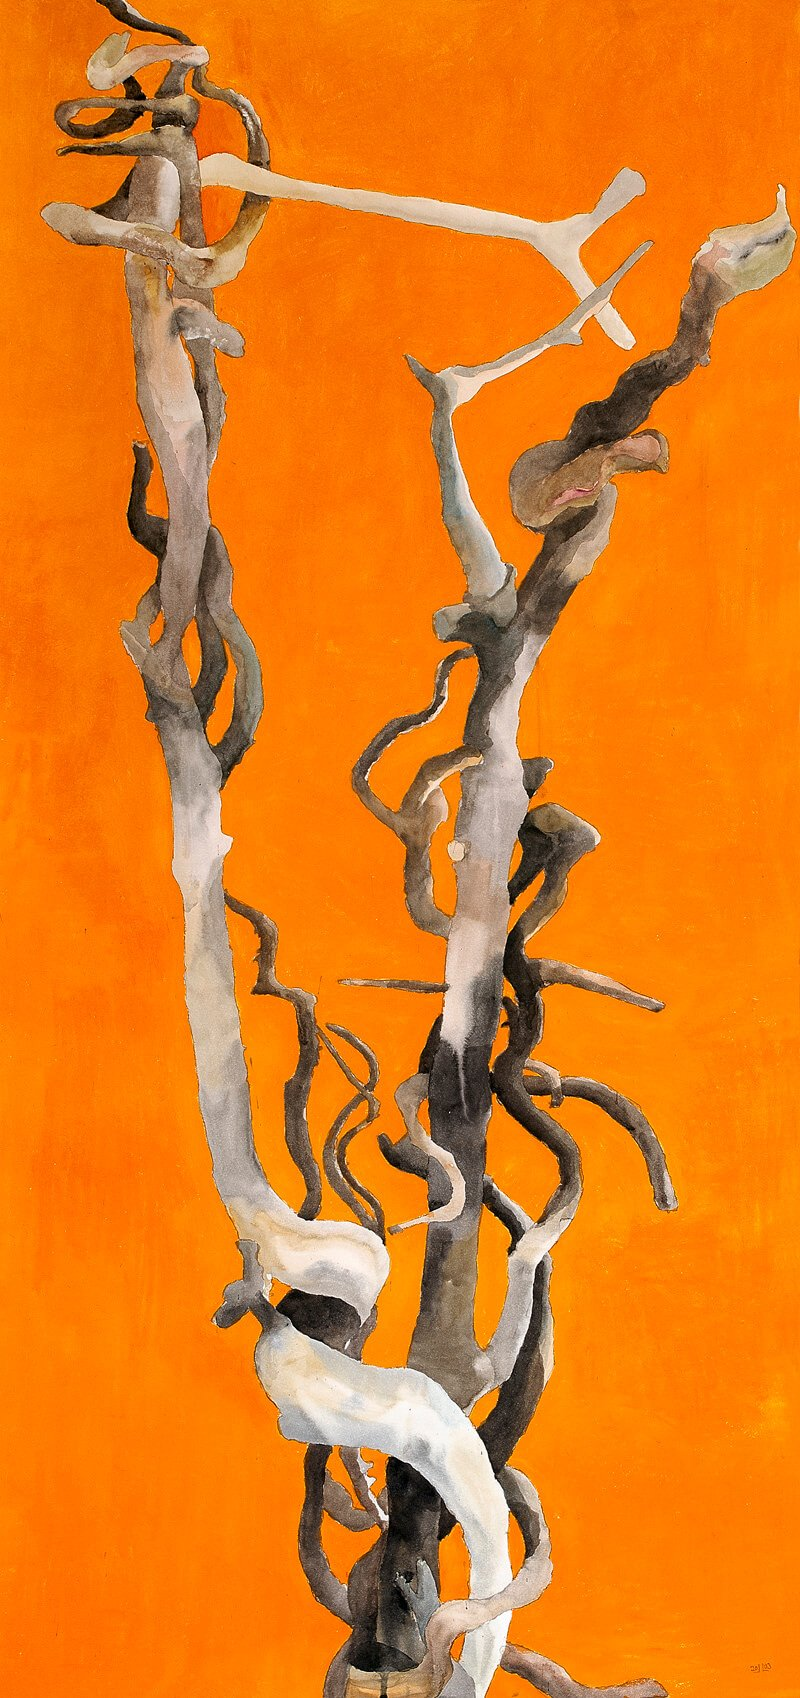 Burwash wood, i, 2002